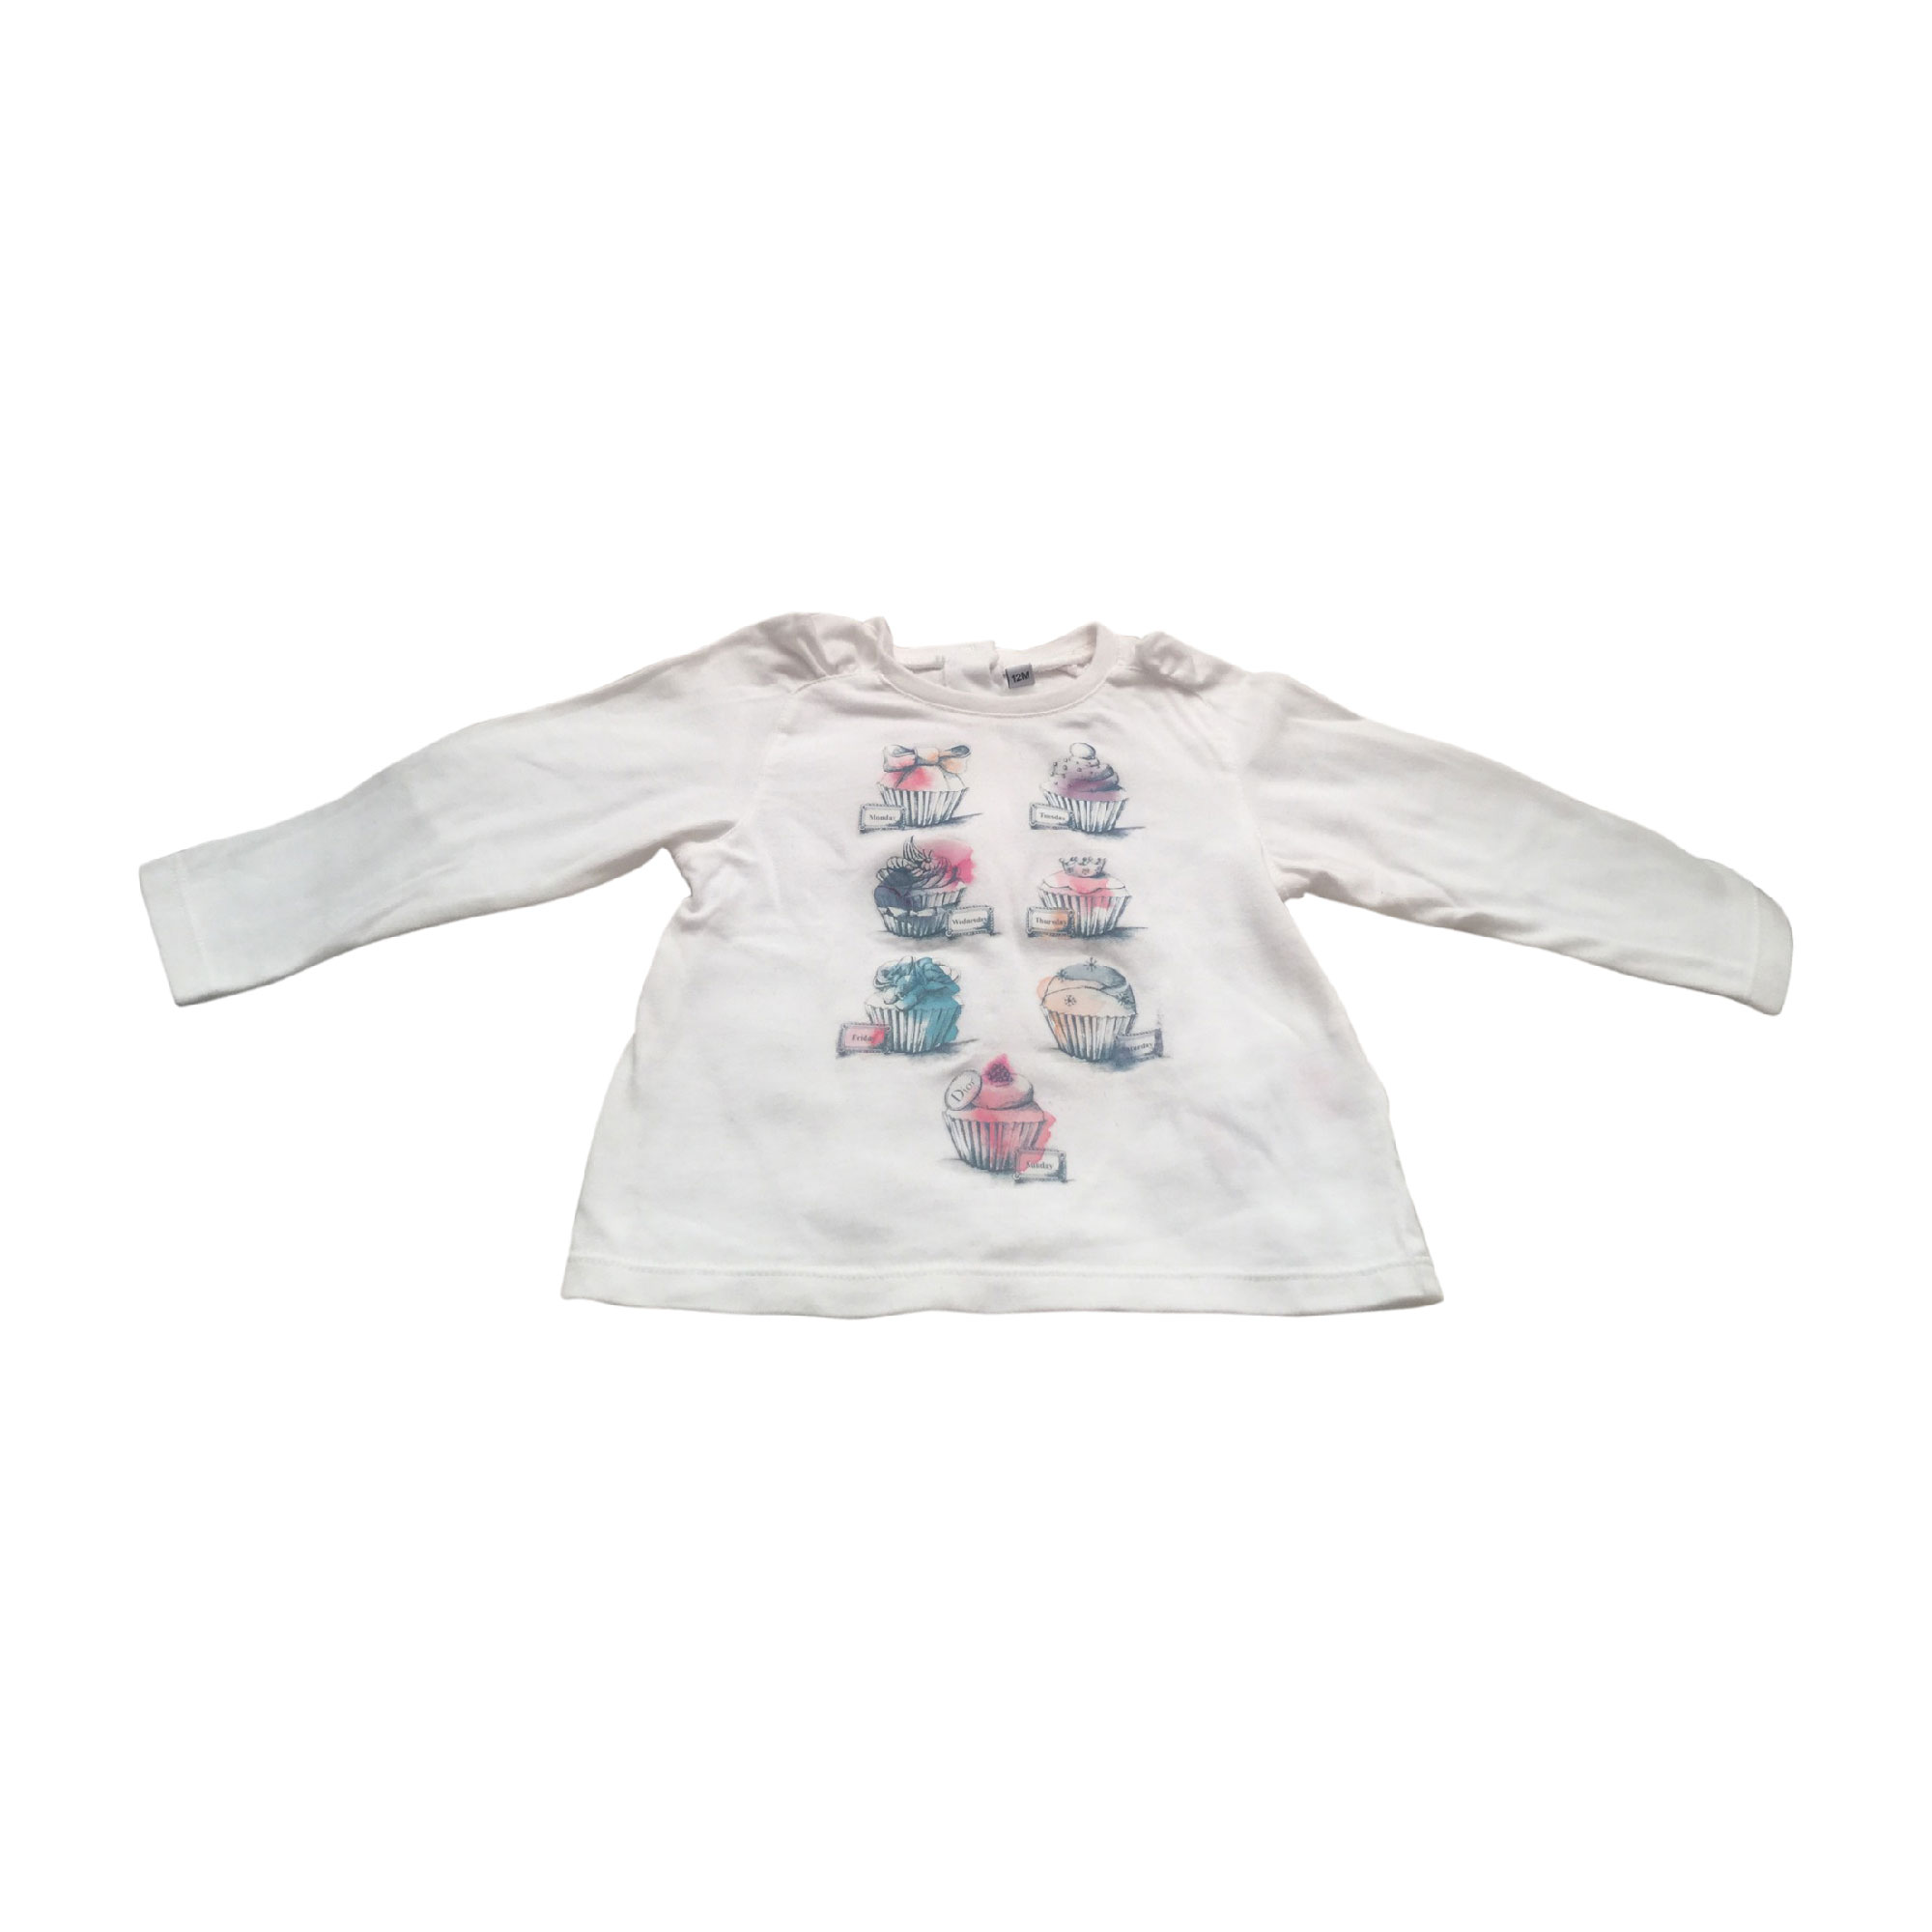 Top, t-shirt BABY DIOR Rosa, fucsia, rosa antico